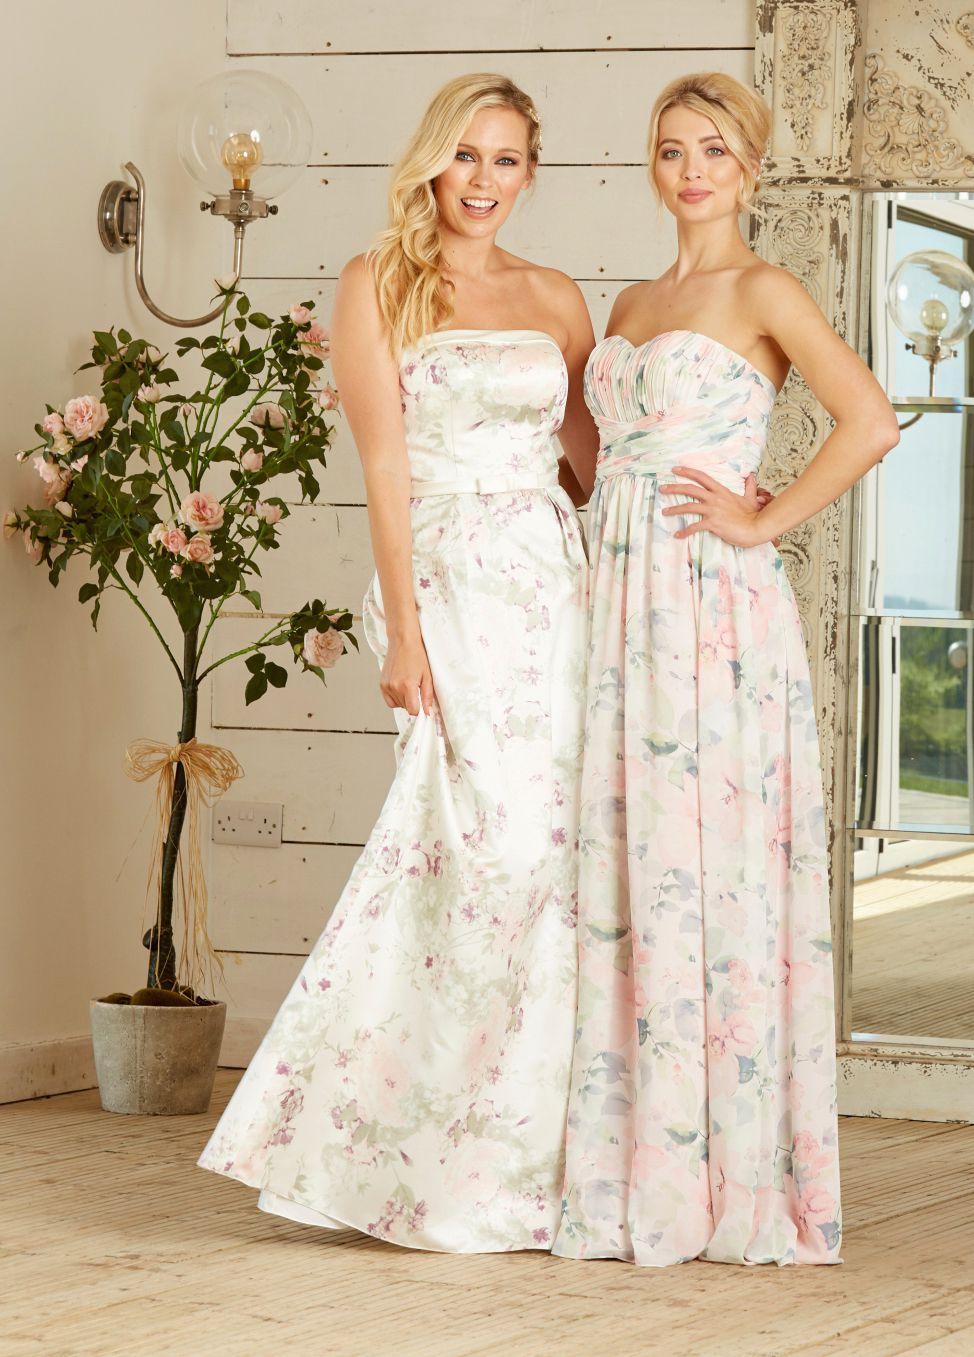 Amanda Wyatt Fl Bridesmaids Dresses Style 2297 And 2298